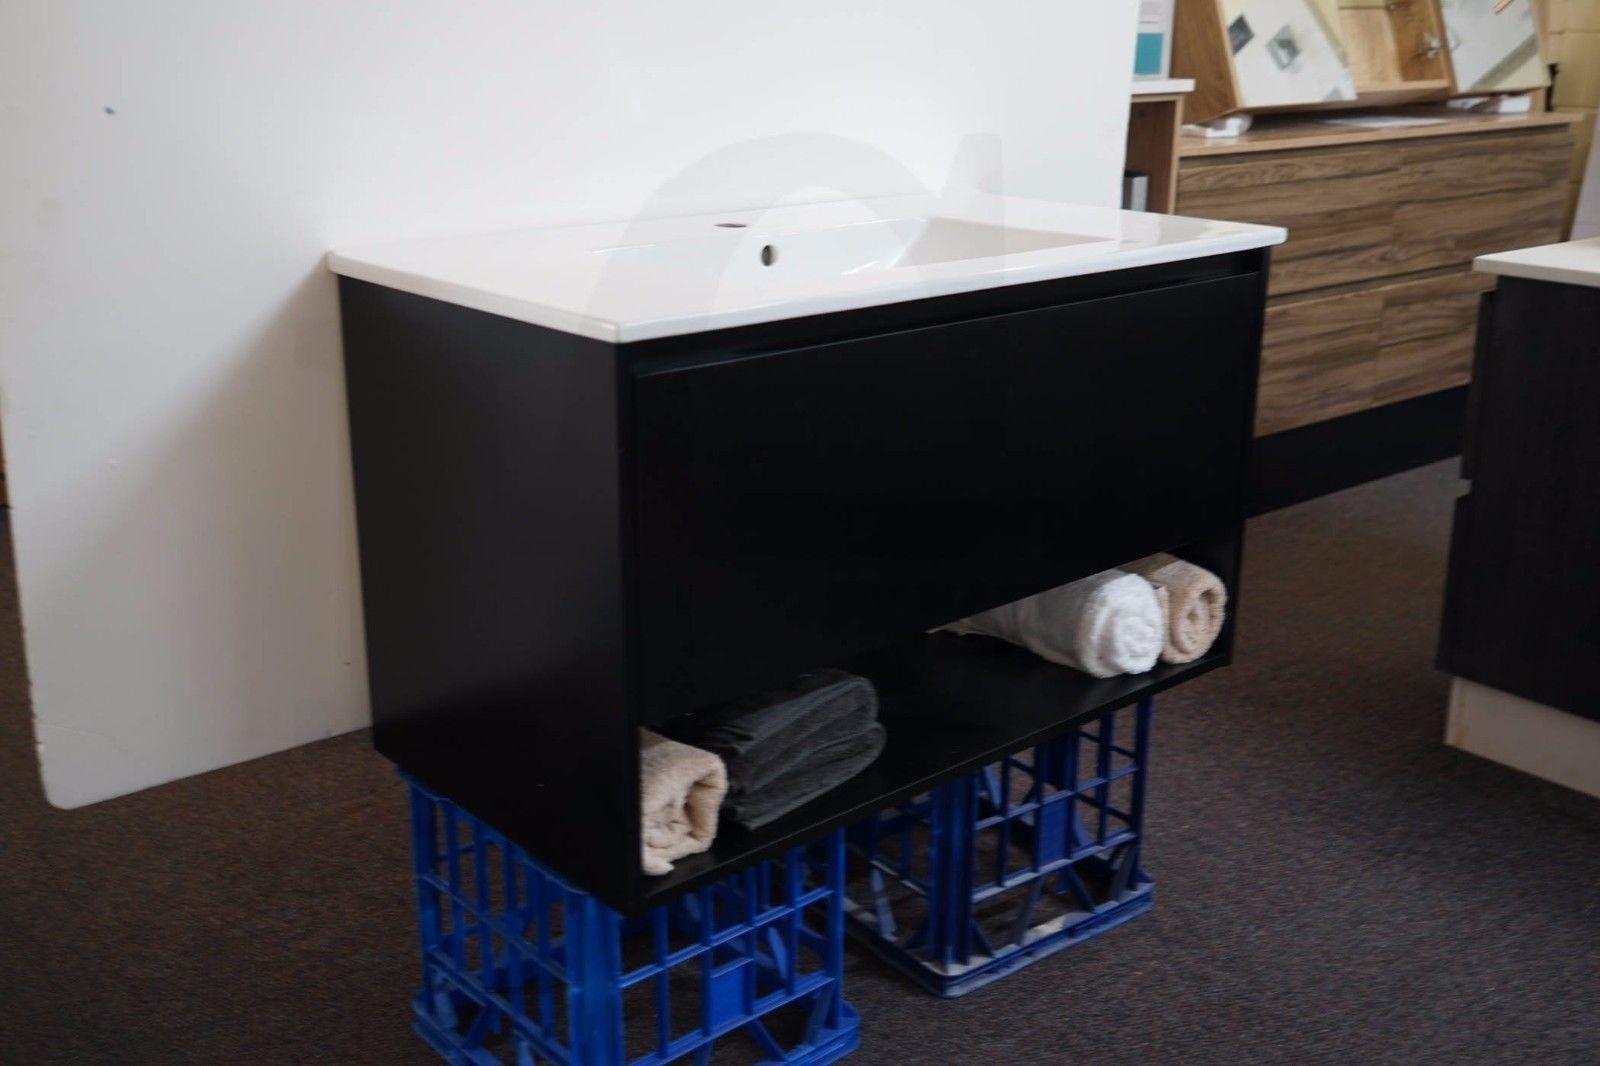 EDEN   900mm Matte Black Polyurethane Wall Hung Bathroom Vanity with ...